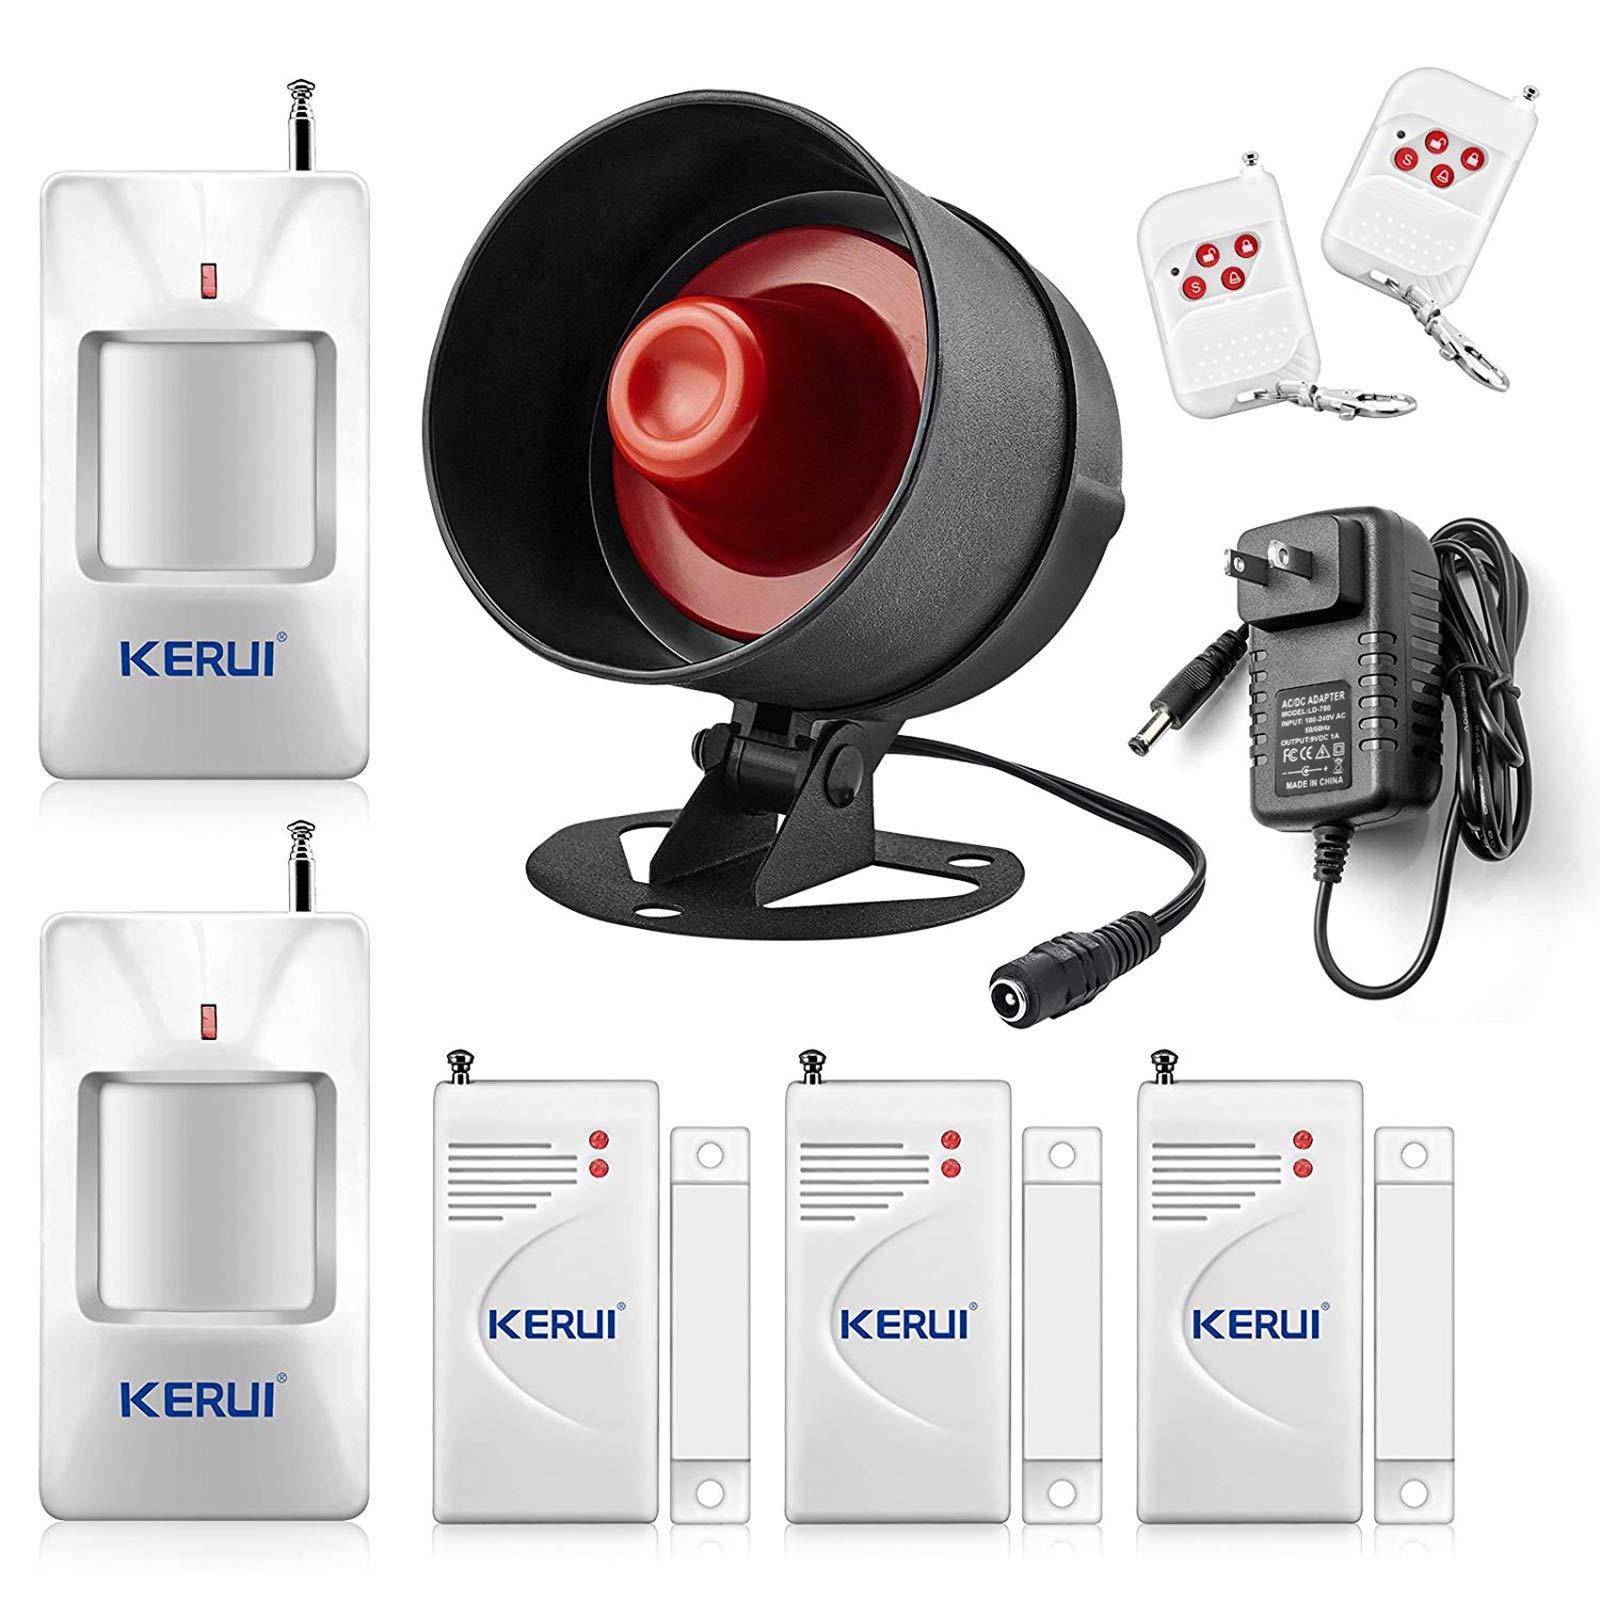 KERUI Standalone Home Office & Shop Security Alarm System Kit, Wireless Loud Indoor/Outdoor Weatherproof Siren Horn with Remote Control and Door Contact Sensor,Motion Sensor,Up to 110db by KERUI